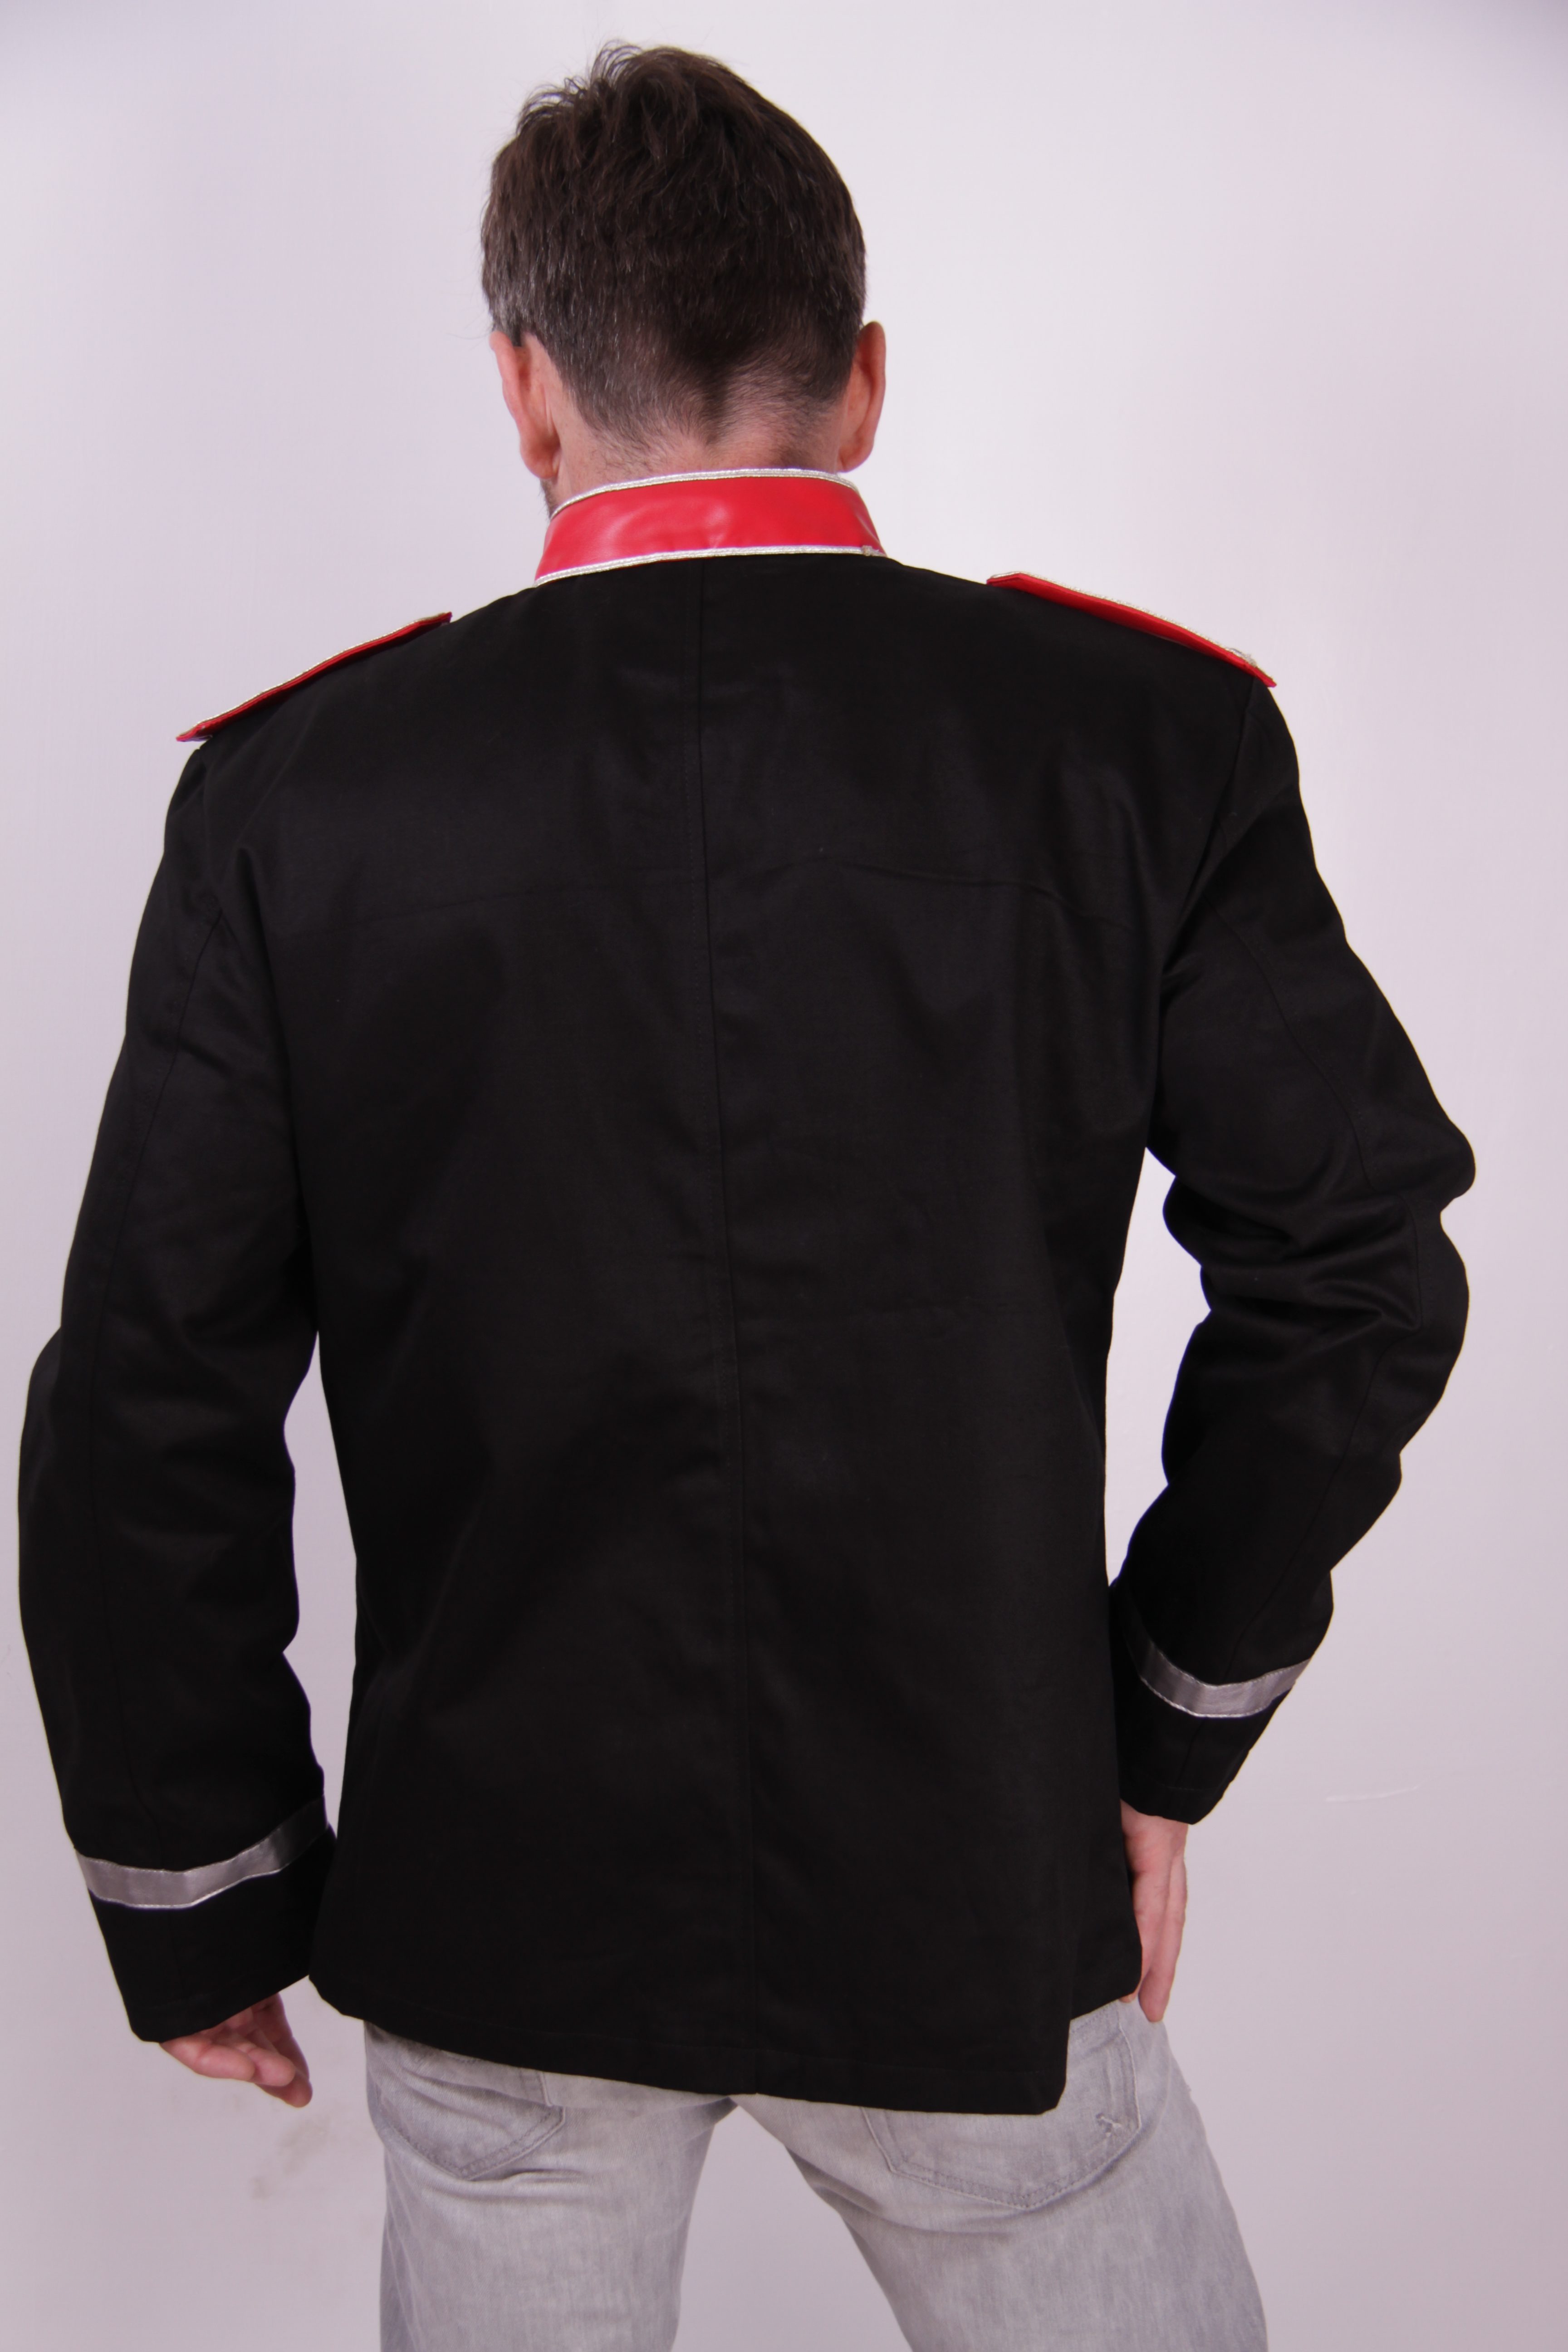 malik_guardsman_style_jacket_lady_ks_black_jackets_and_outerwear_3.JPG